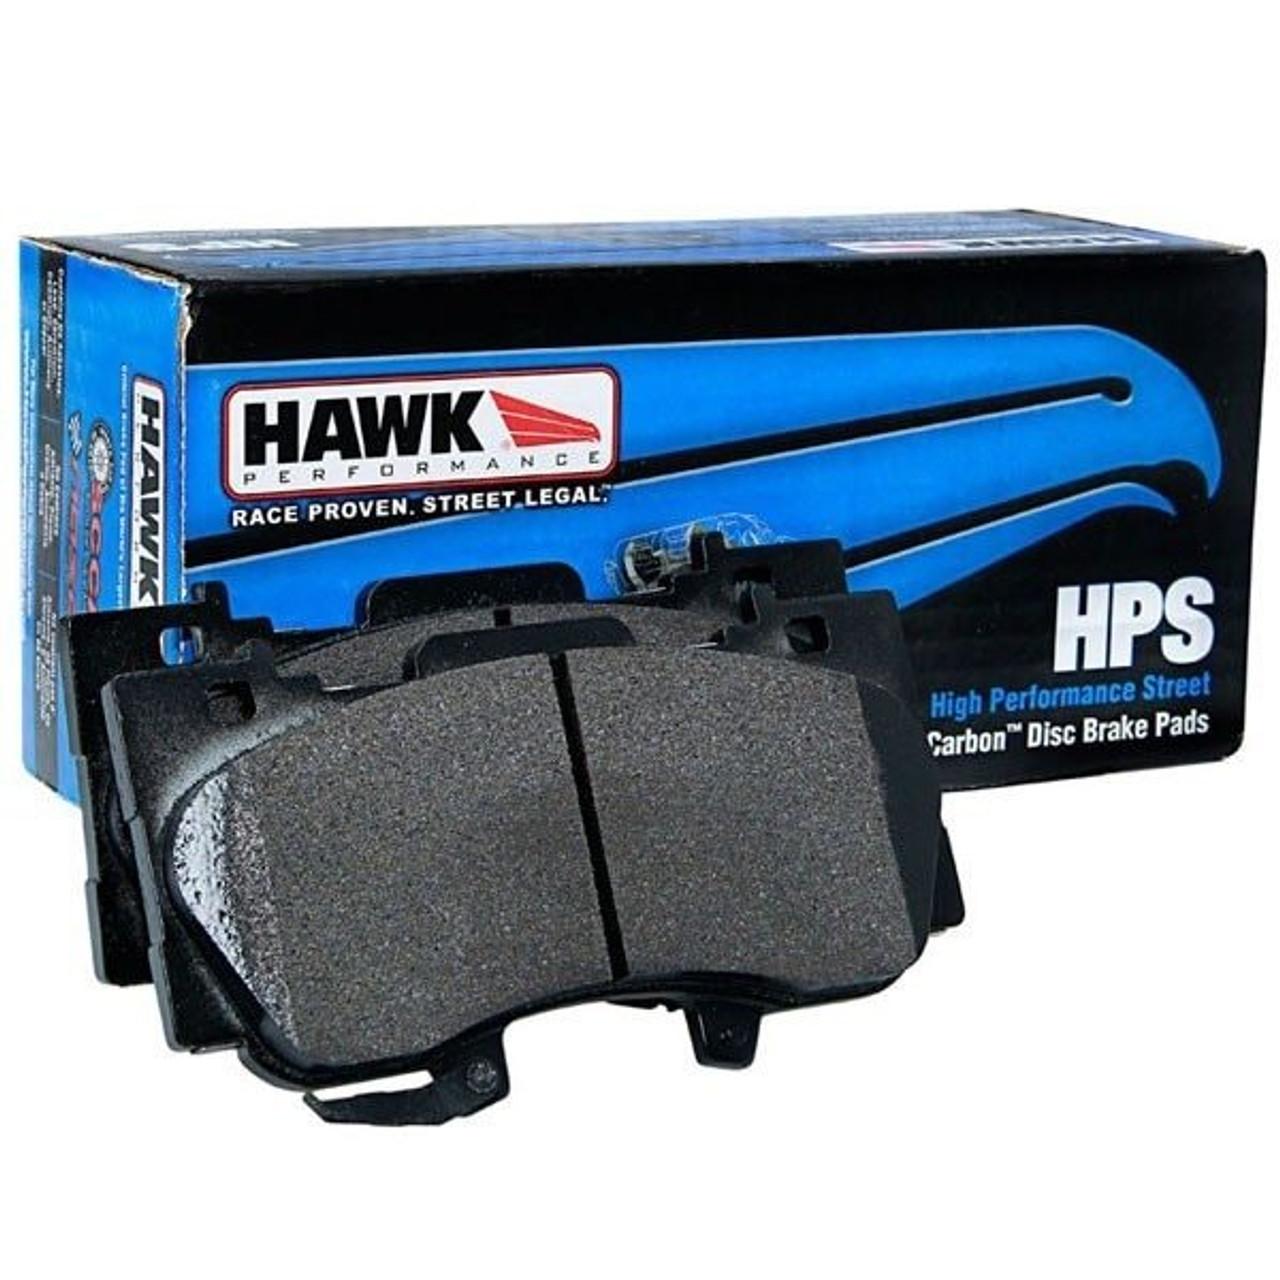 Hawk Brake Pads >> Hawk Hps Brake Pads Rear Pair 2009 2015 Cadillac Cts V 2015 2017 Chevy Ss 2010 2015 Camaro Ss Zl1 Dodge Jeep Brembo Applications